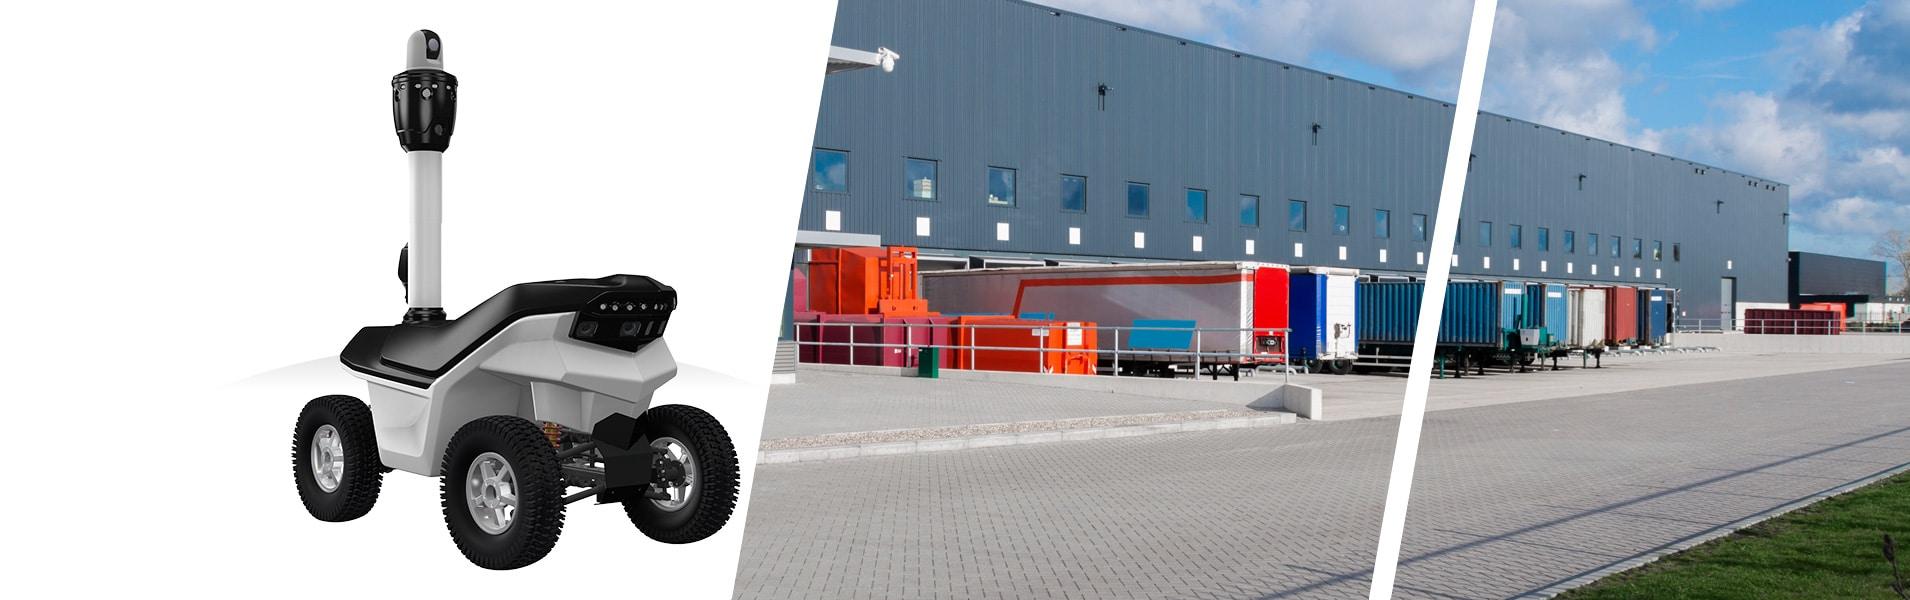 Warehouses mobile security surveillance robot